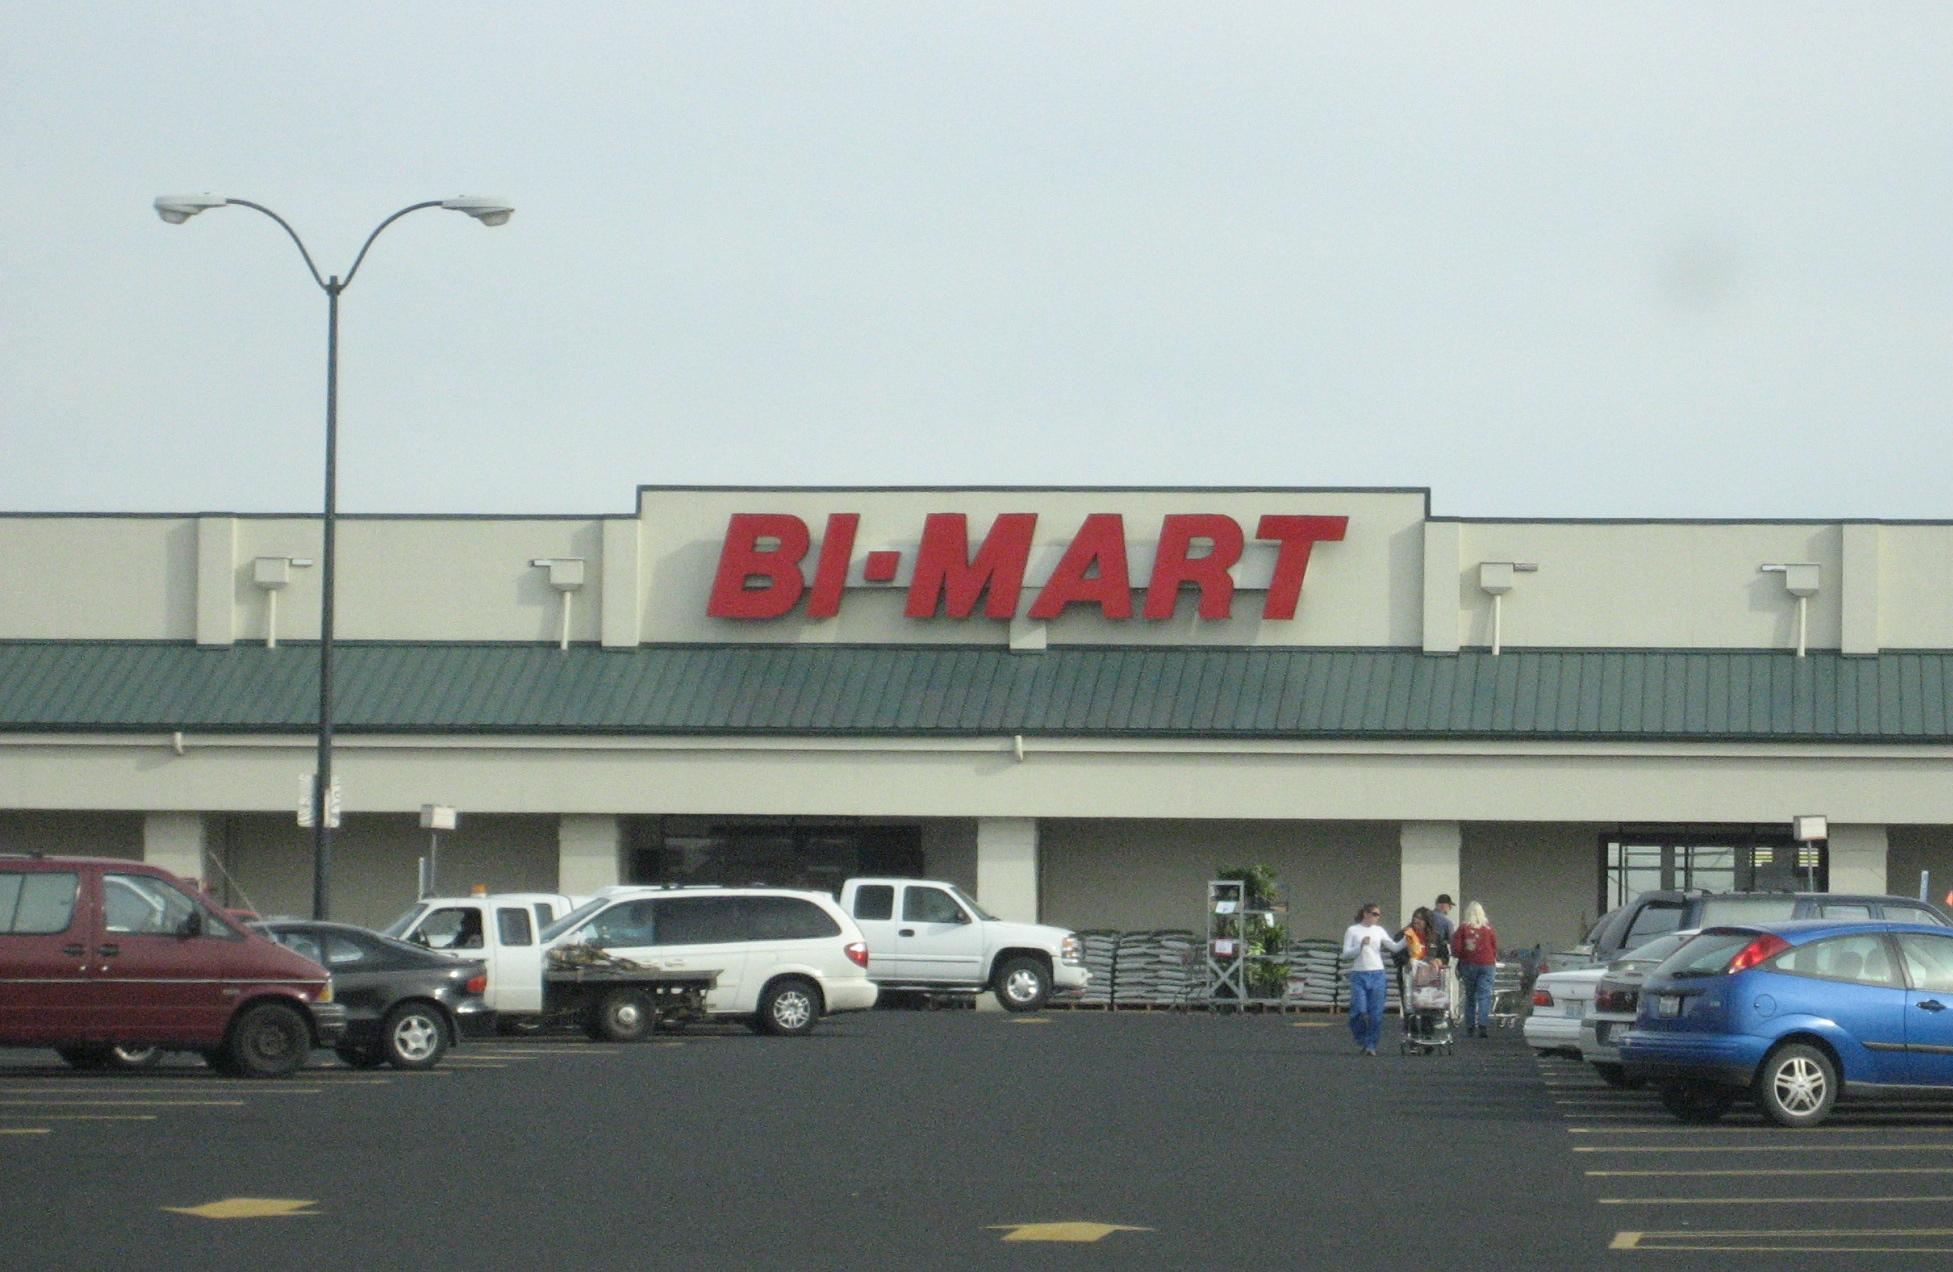 The Bi-Mart